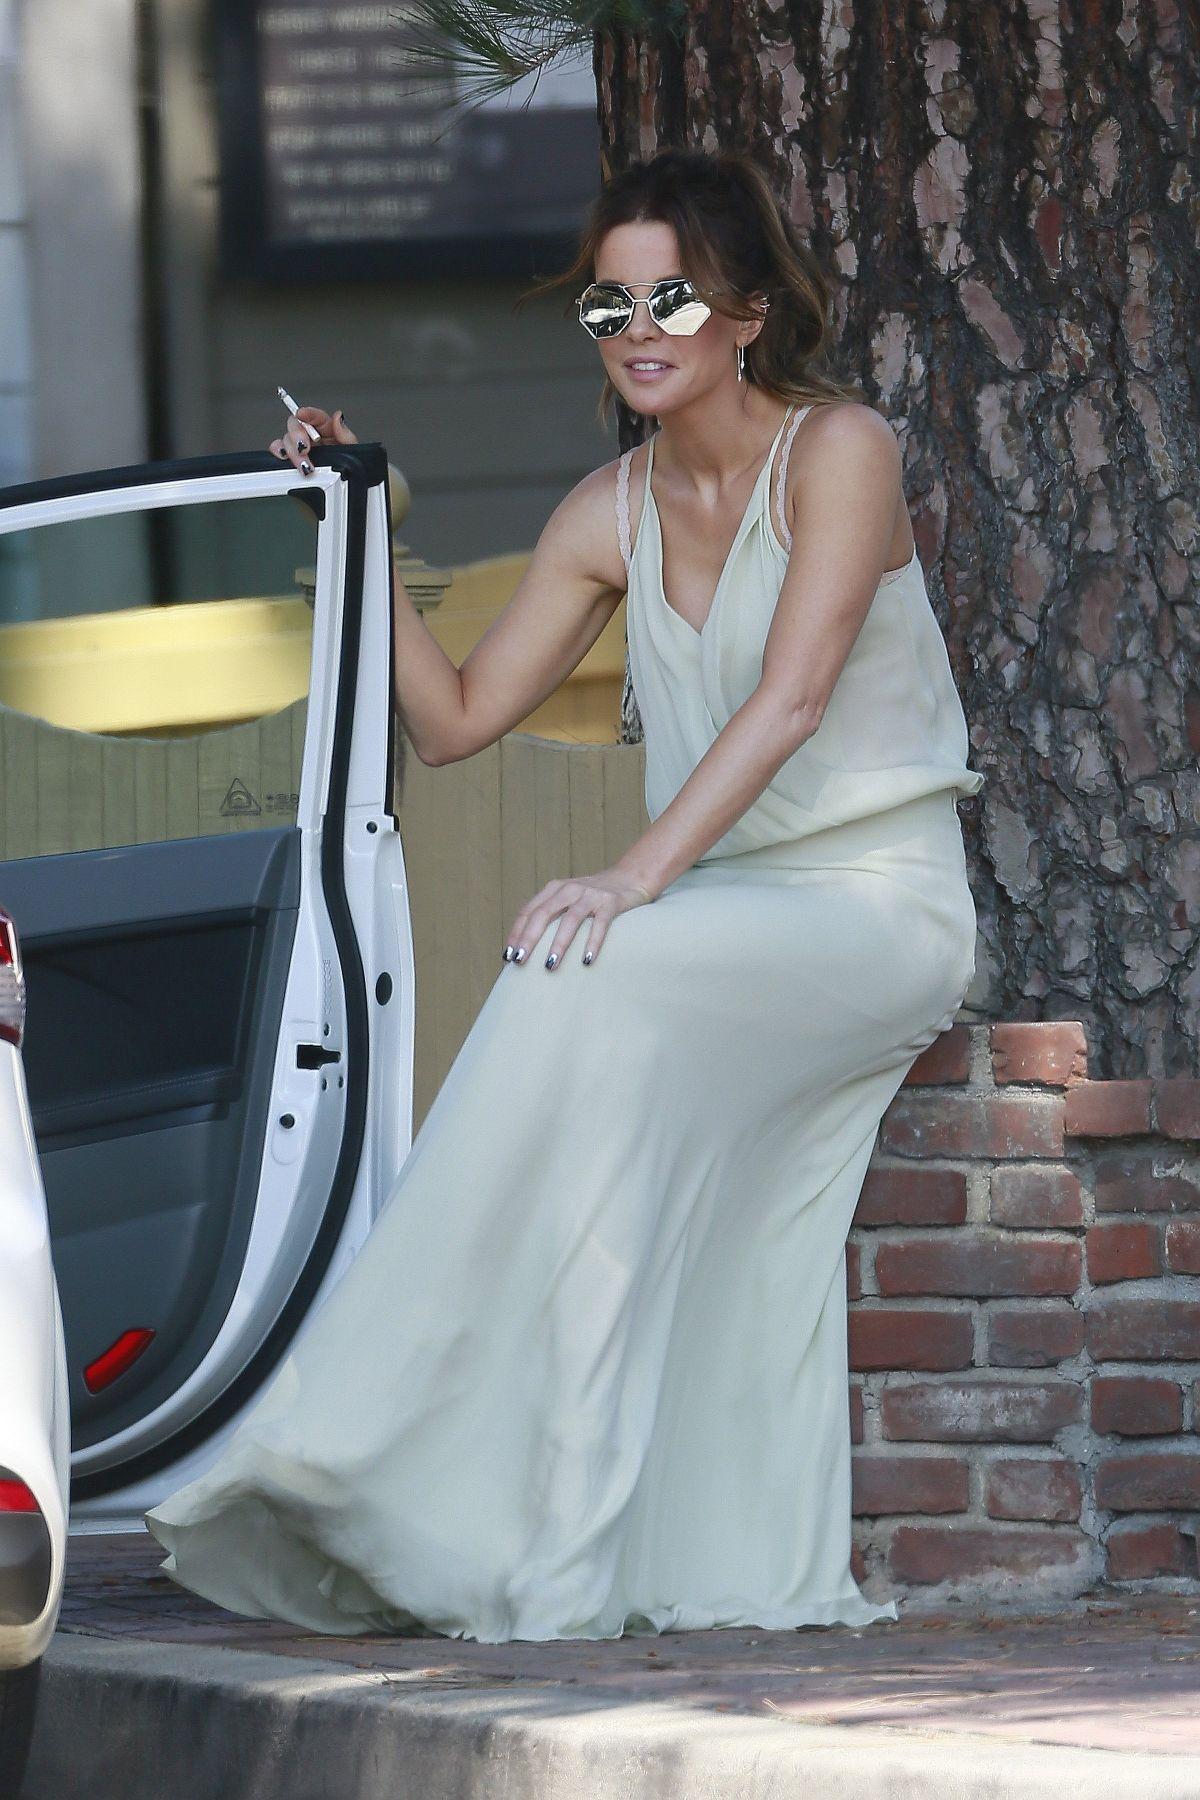 KATE BECKINSALE at Her Daughter's Graduation in Studio ... Kate Beckinsale Daughter